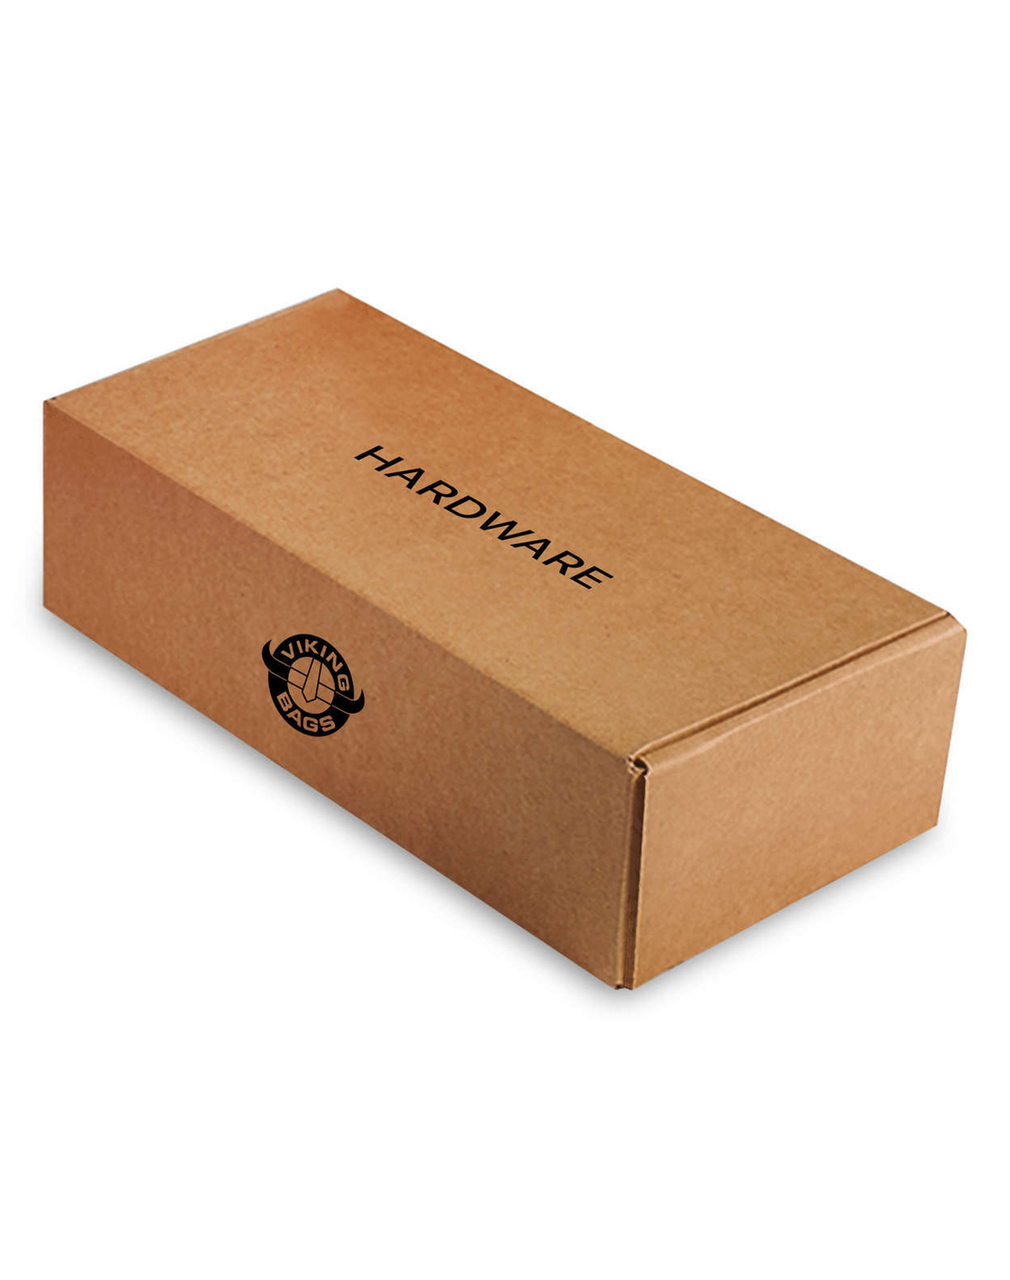 Triumph Thunderbird Charger Braided Motorcycle Saddlebags Box